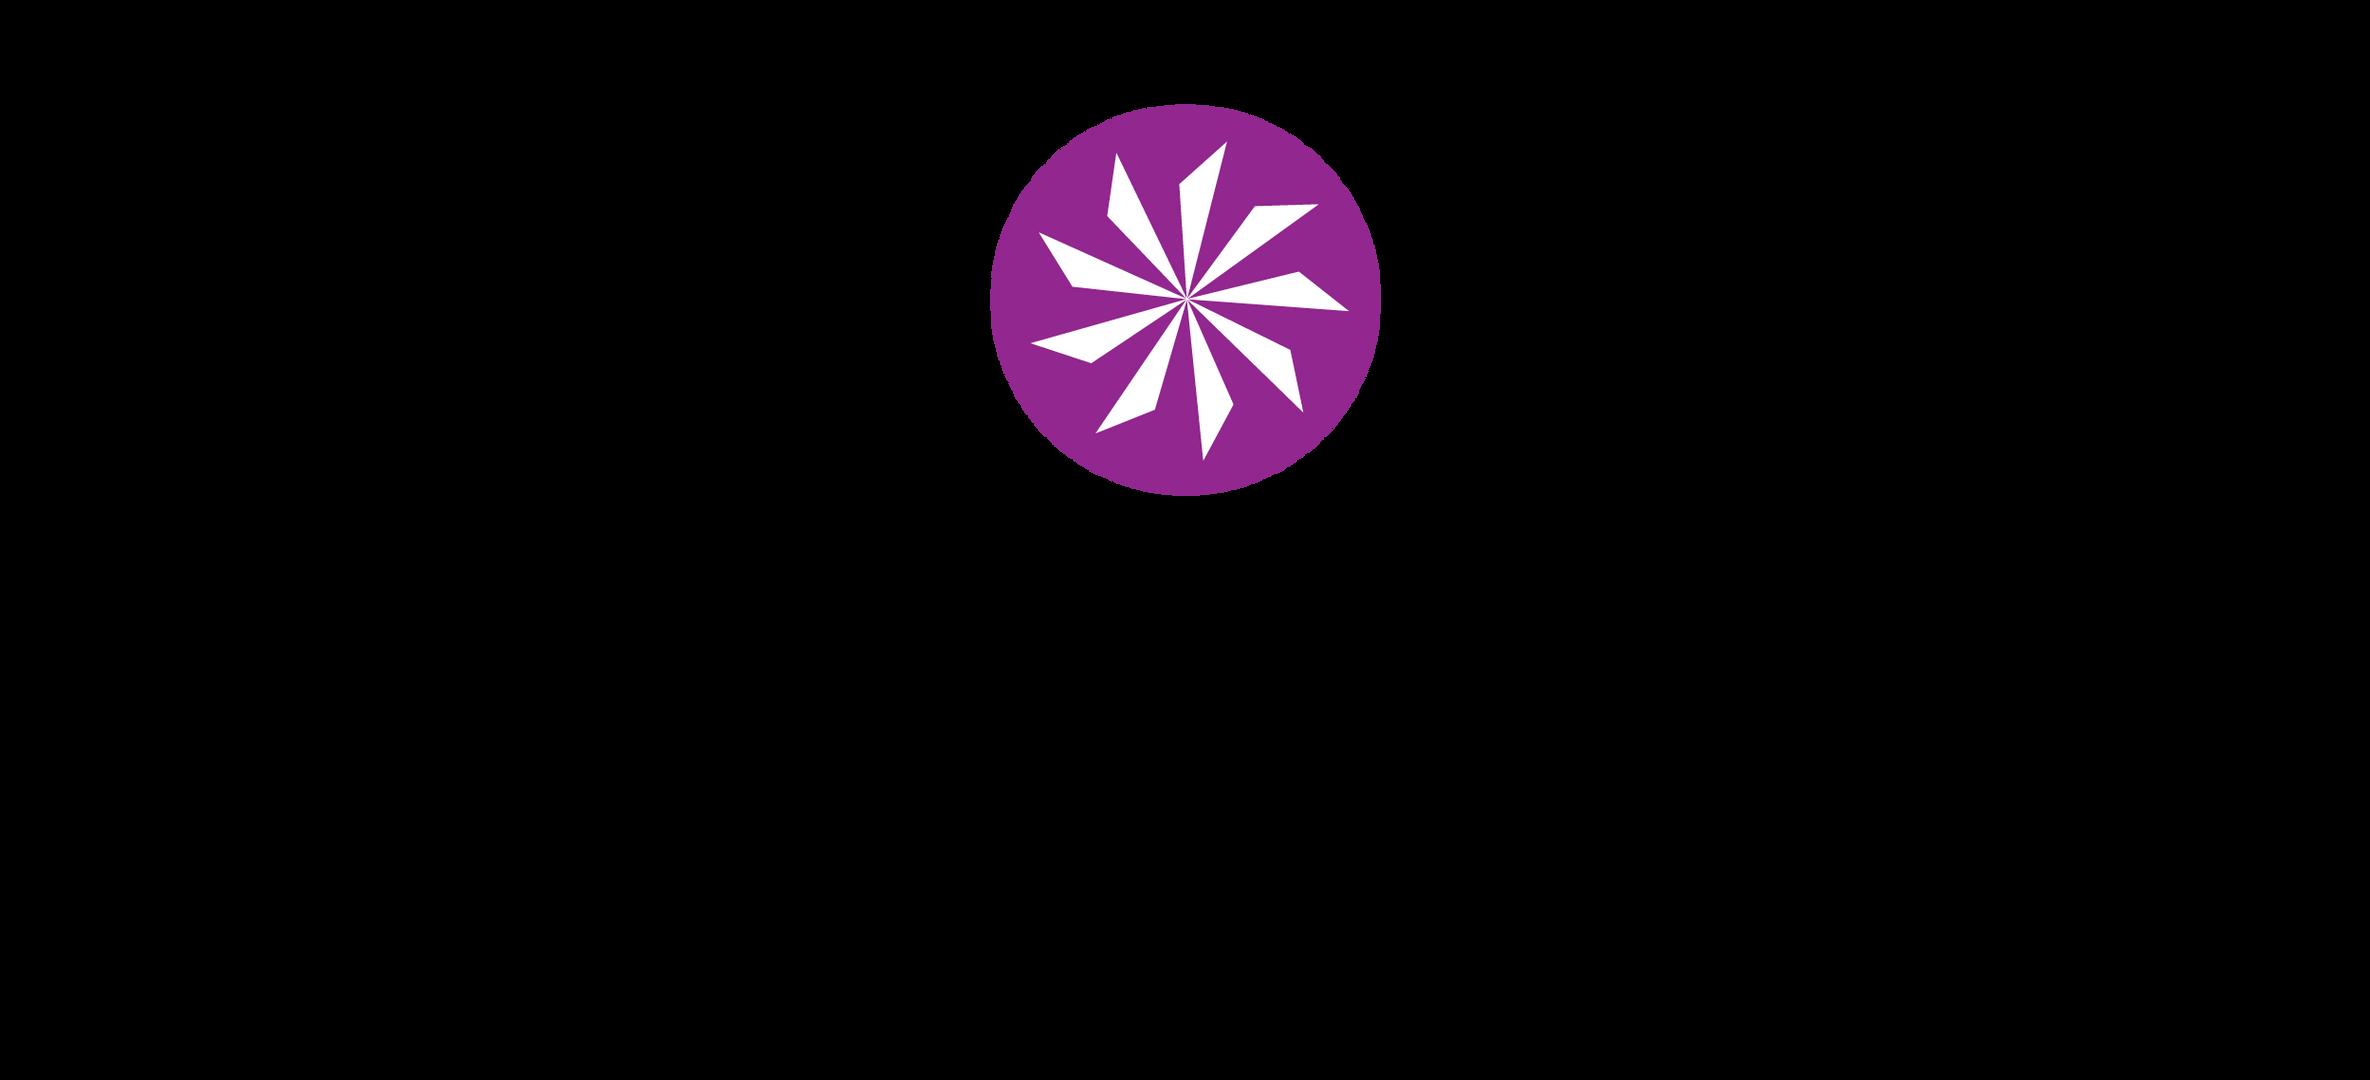 athleta-logo-transparent-png-large-1.png